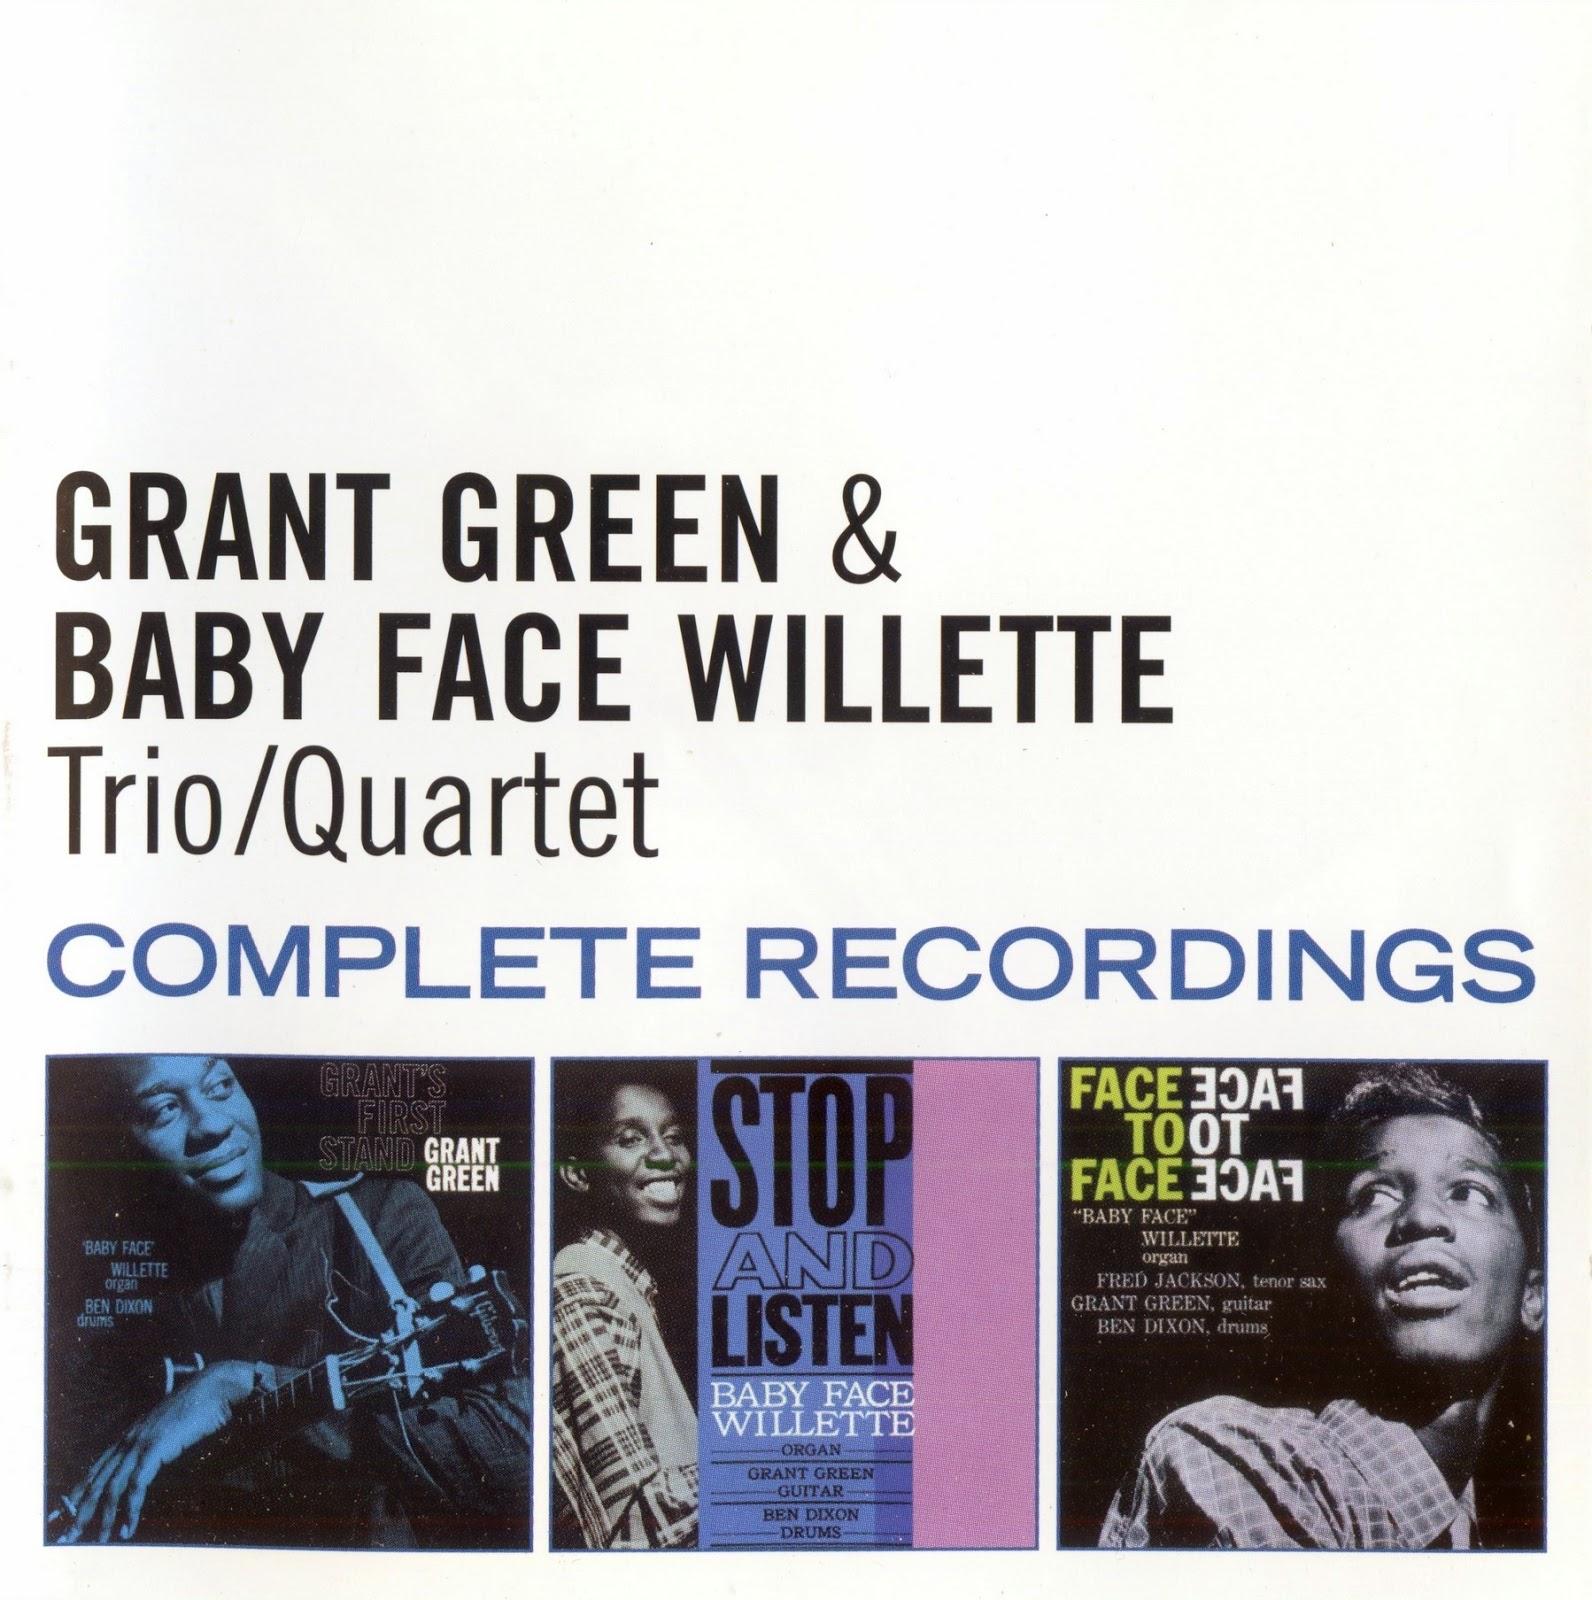 GRANT GREEN - Grant Green %